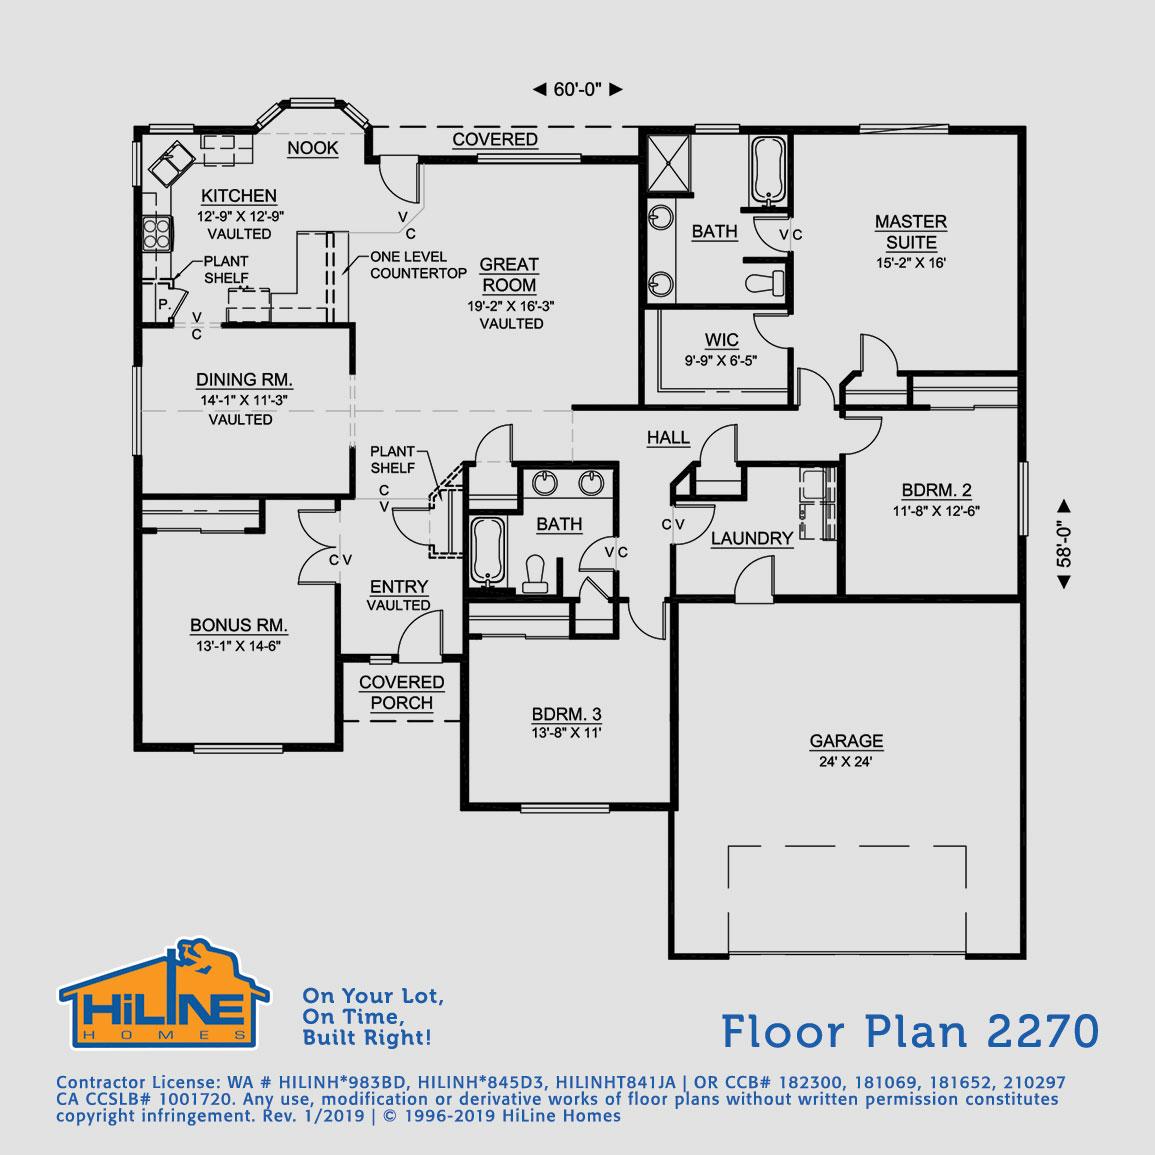 Floorplan 2270